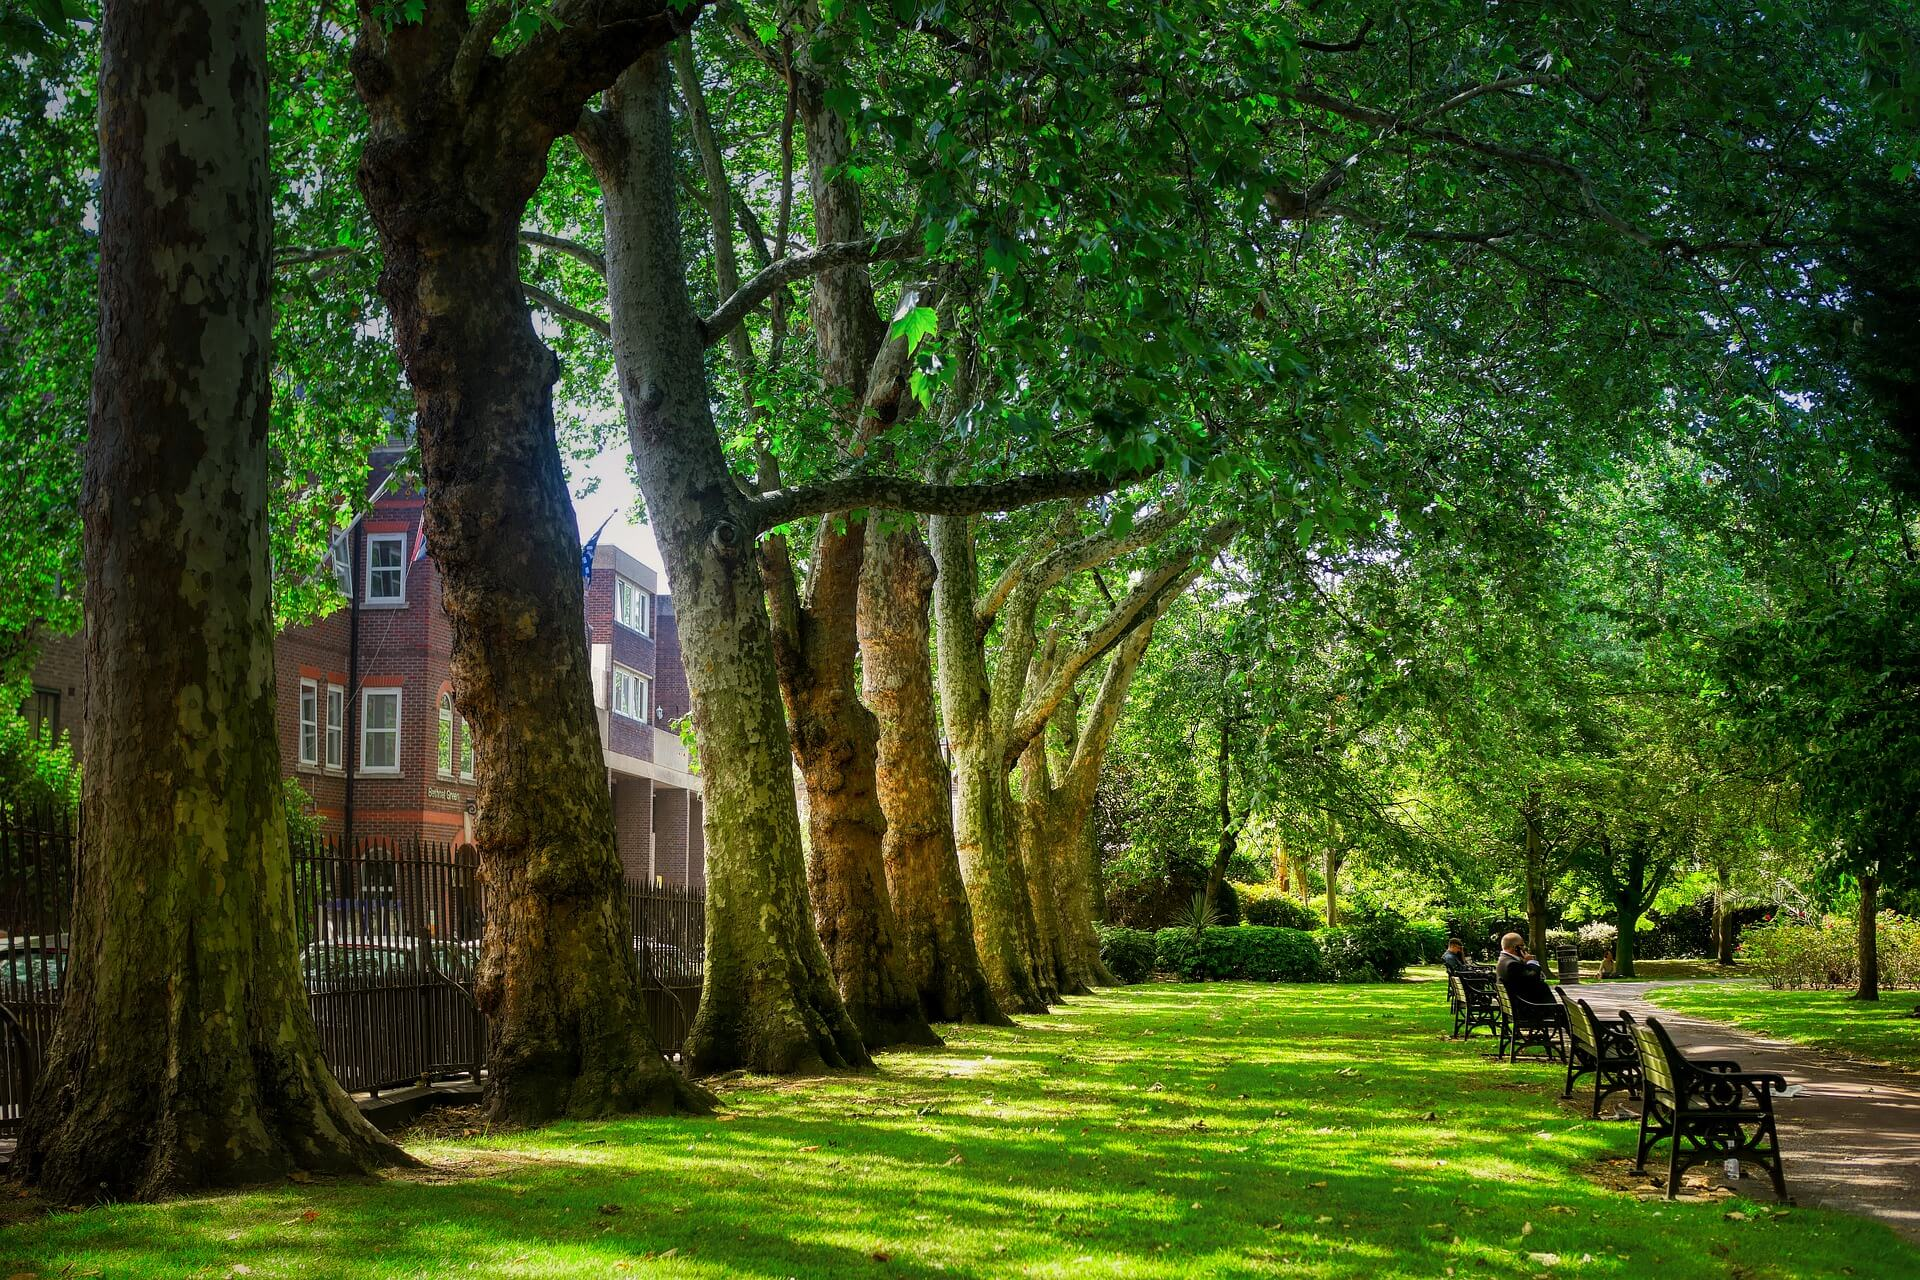 London drveće